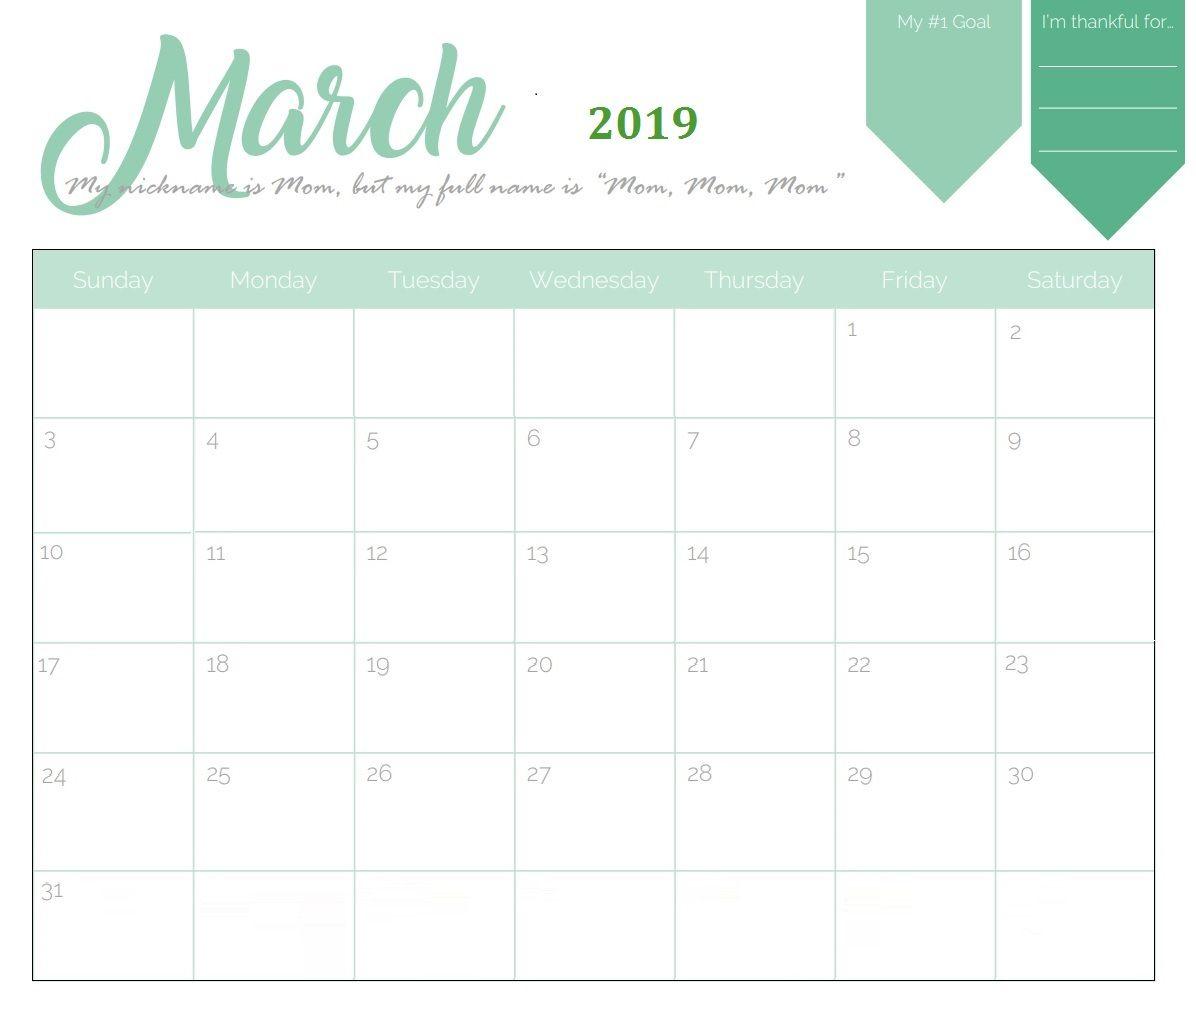 Printable Calendar 2019 Imom   Printable Calendar 2019 with regard to 2020 Imom Free Calendars To Print